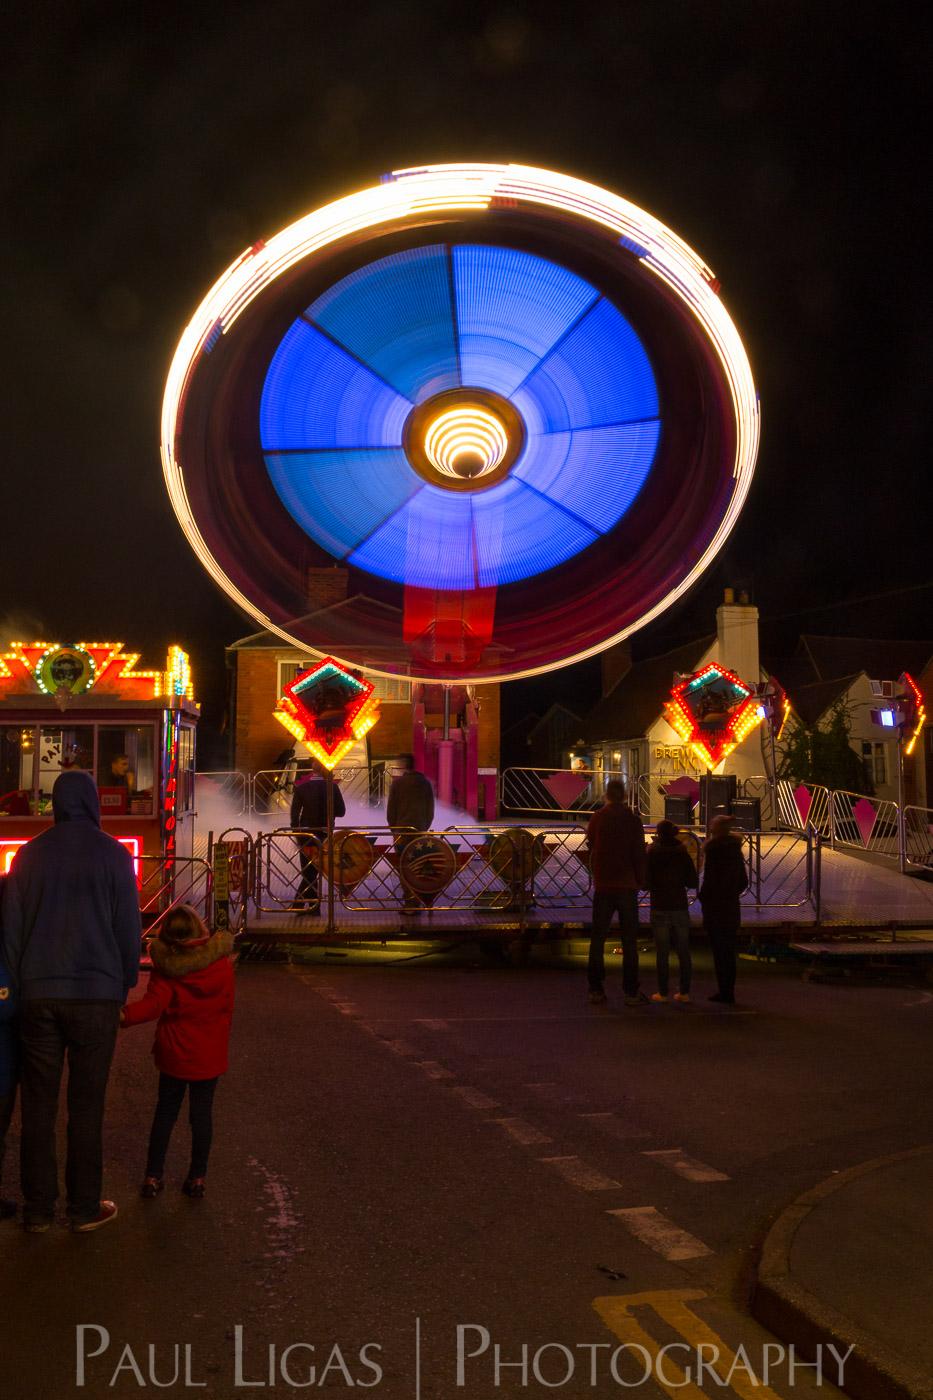 The Ledbury Fair, Herefordshire, people, street photographer photography event candid 2274